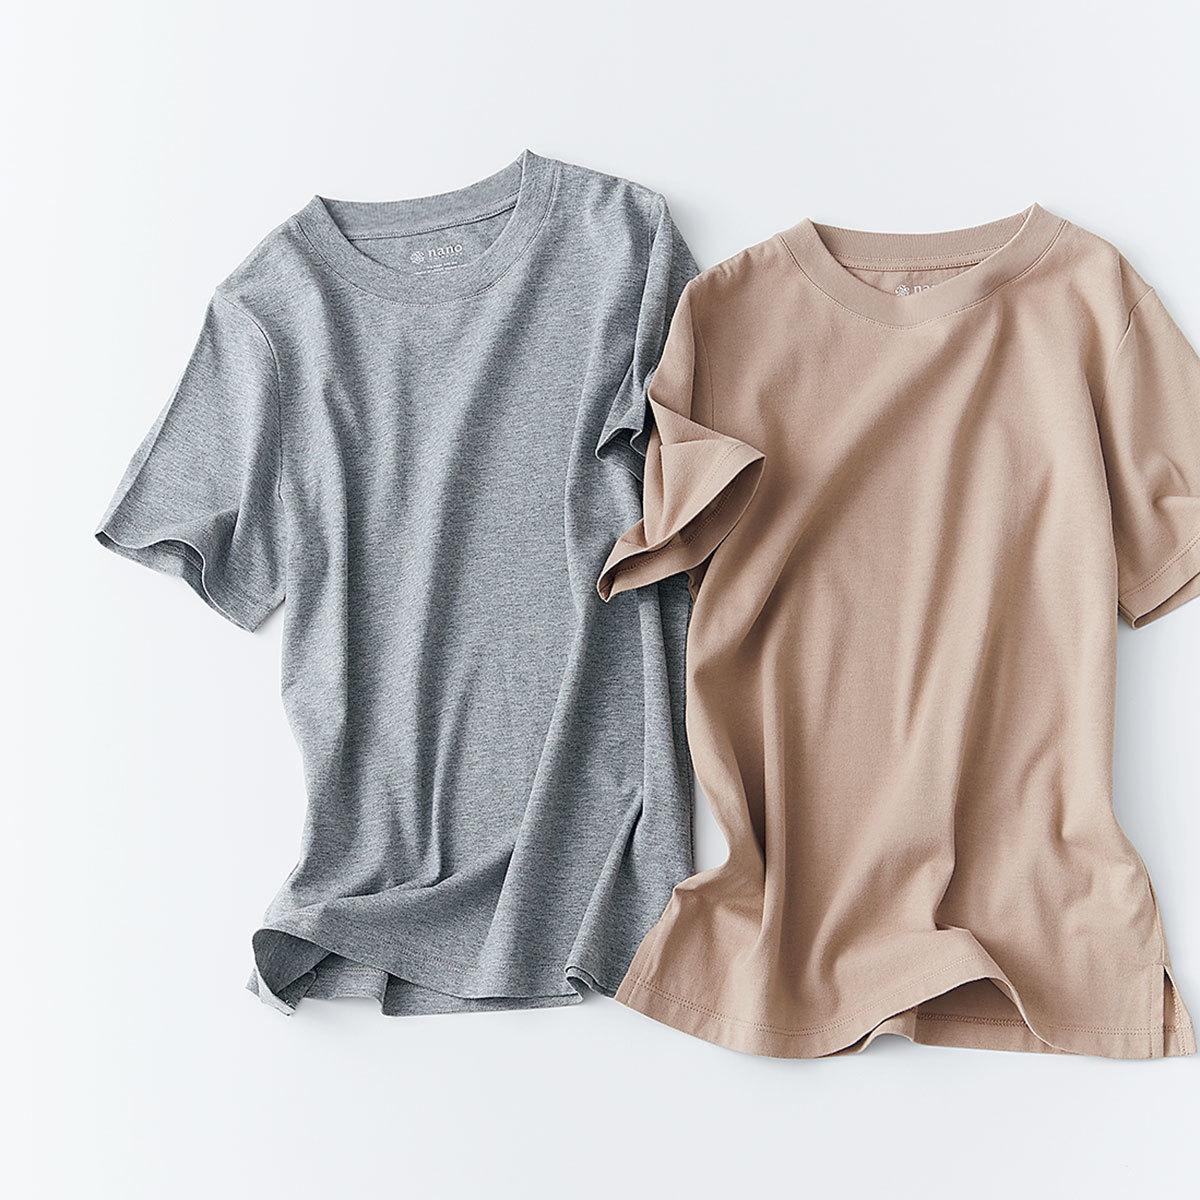 "Tシャツコーデの""あるある悩み""を解決!アラフォーがTシャツをもっと素敵に着るために知っておくべきこと 40代ファッション_1_7"